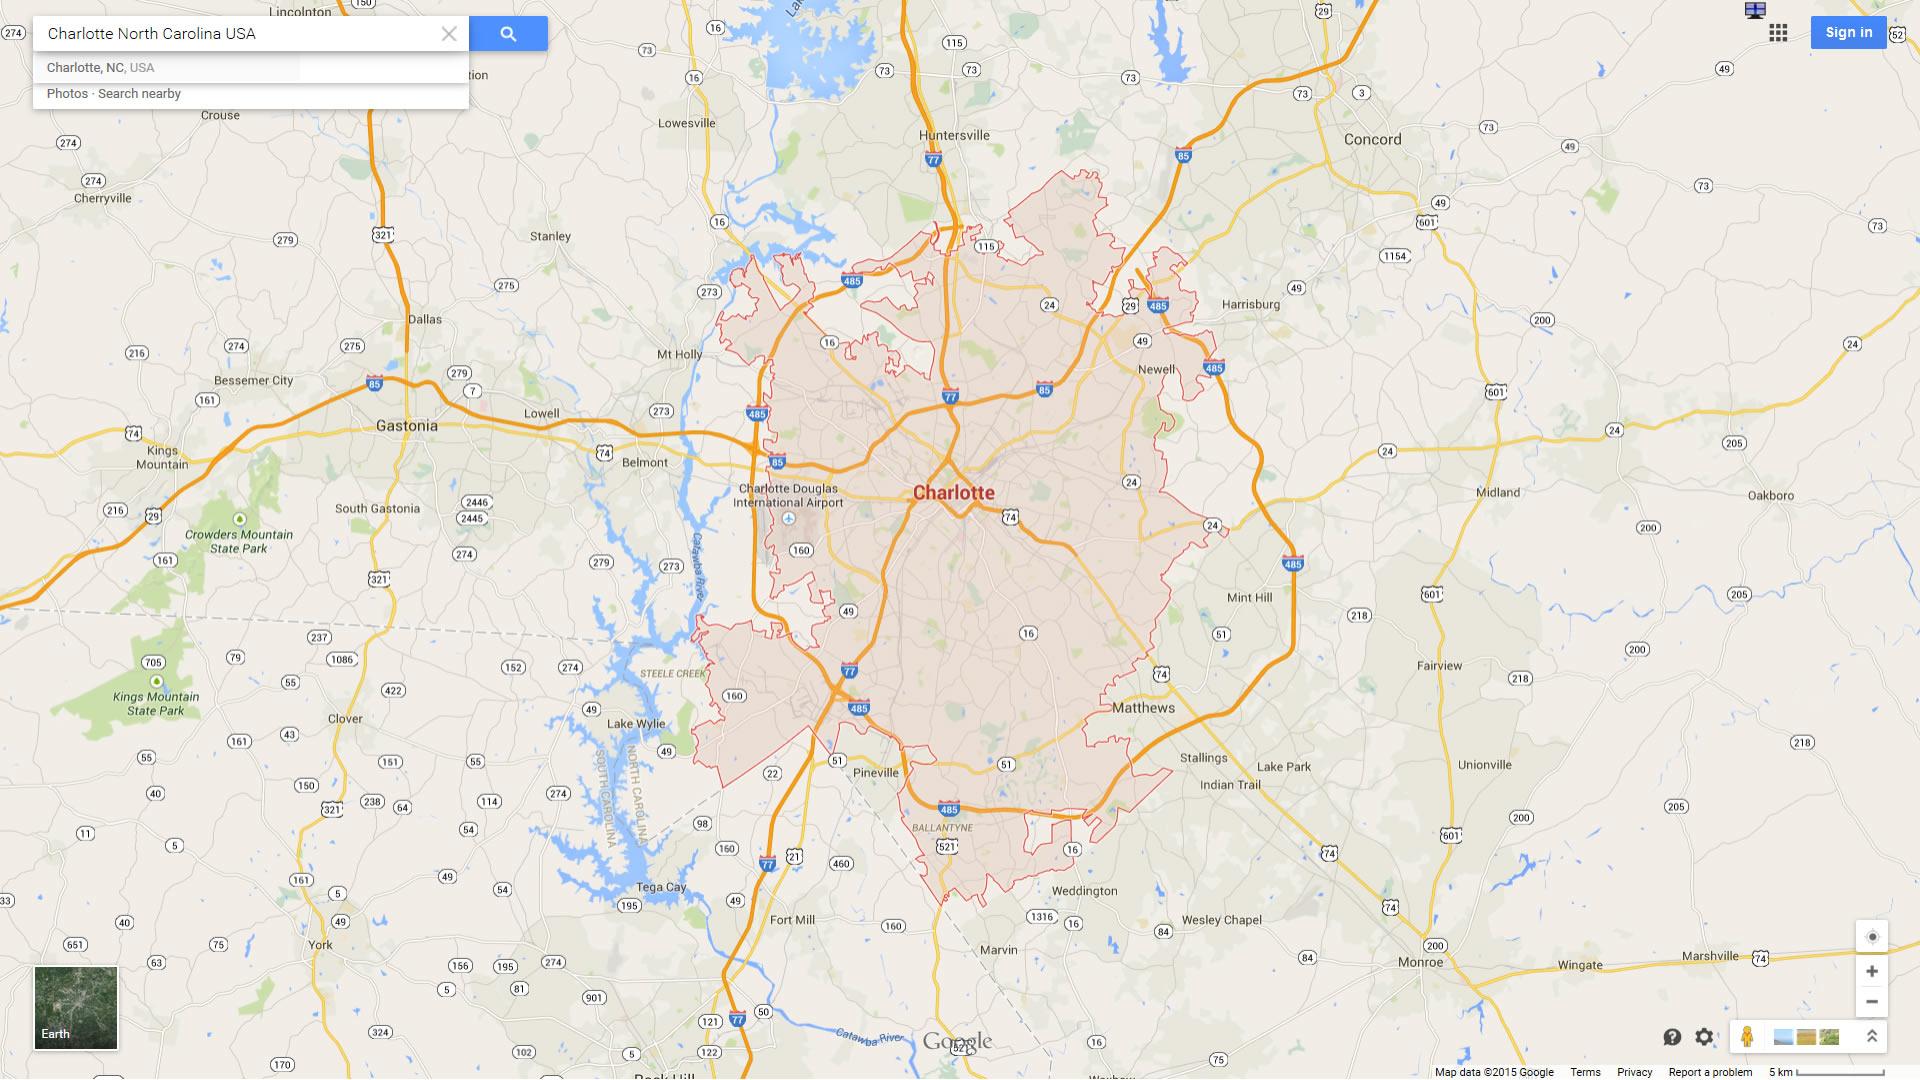 Charlotte North Carolina Map - Google maps charlotte usa